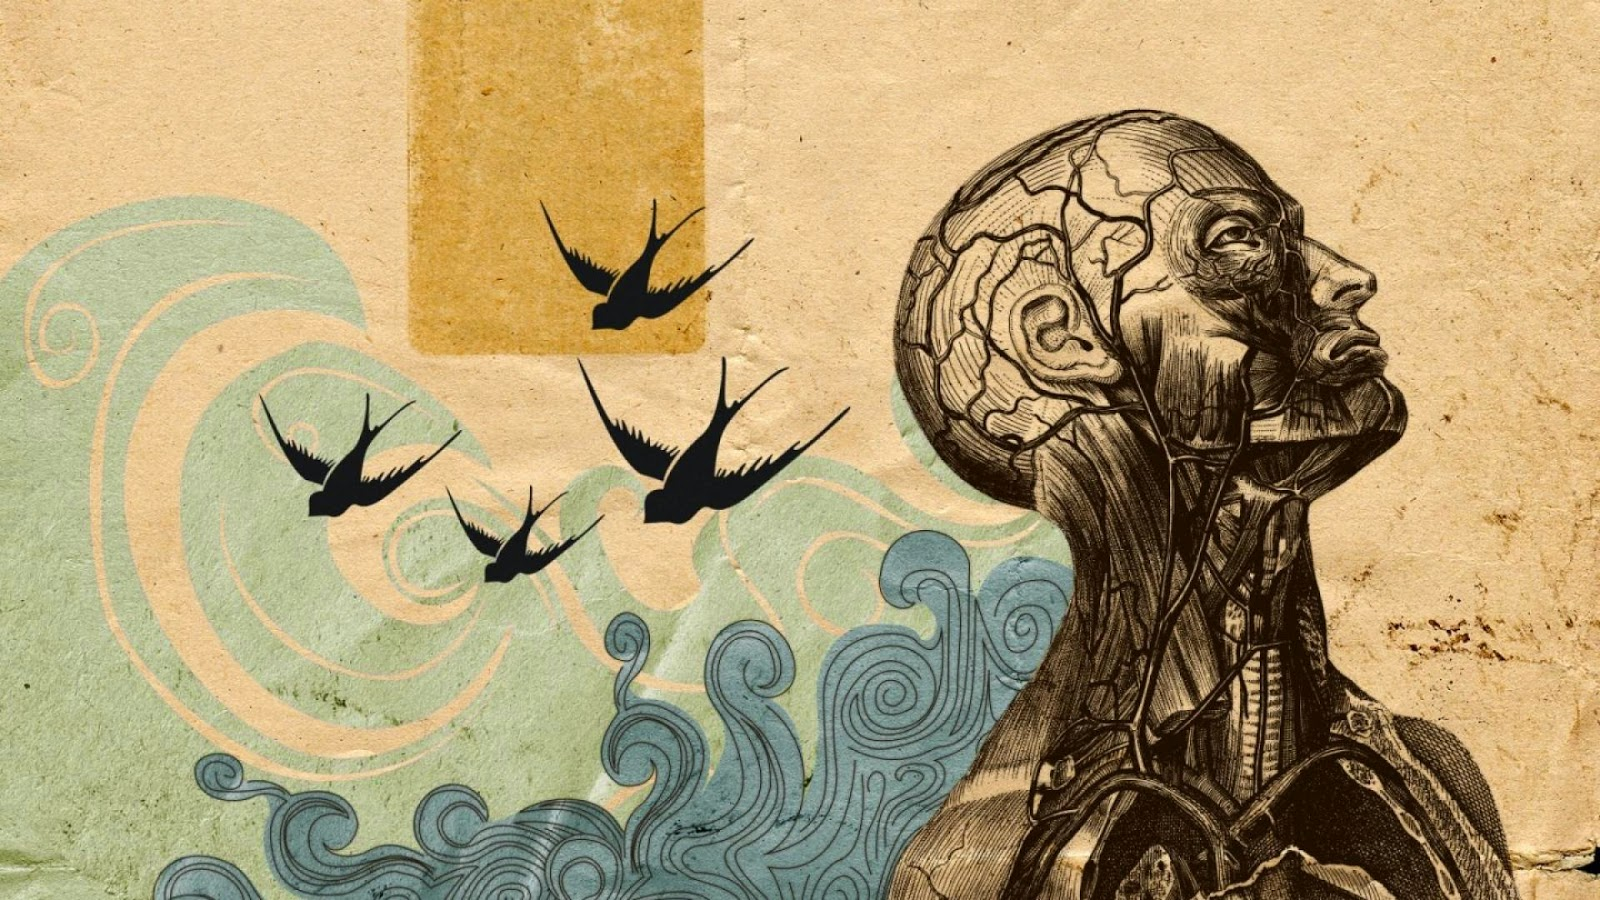 Surrealism-Wallpaper-1440x900-49461